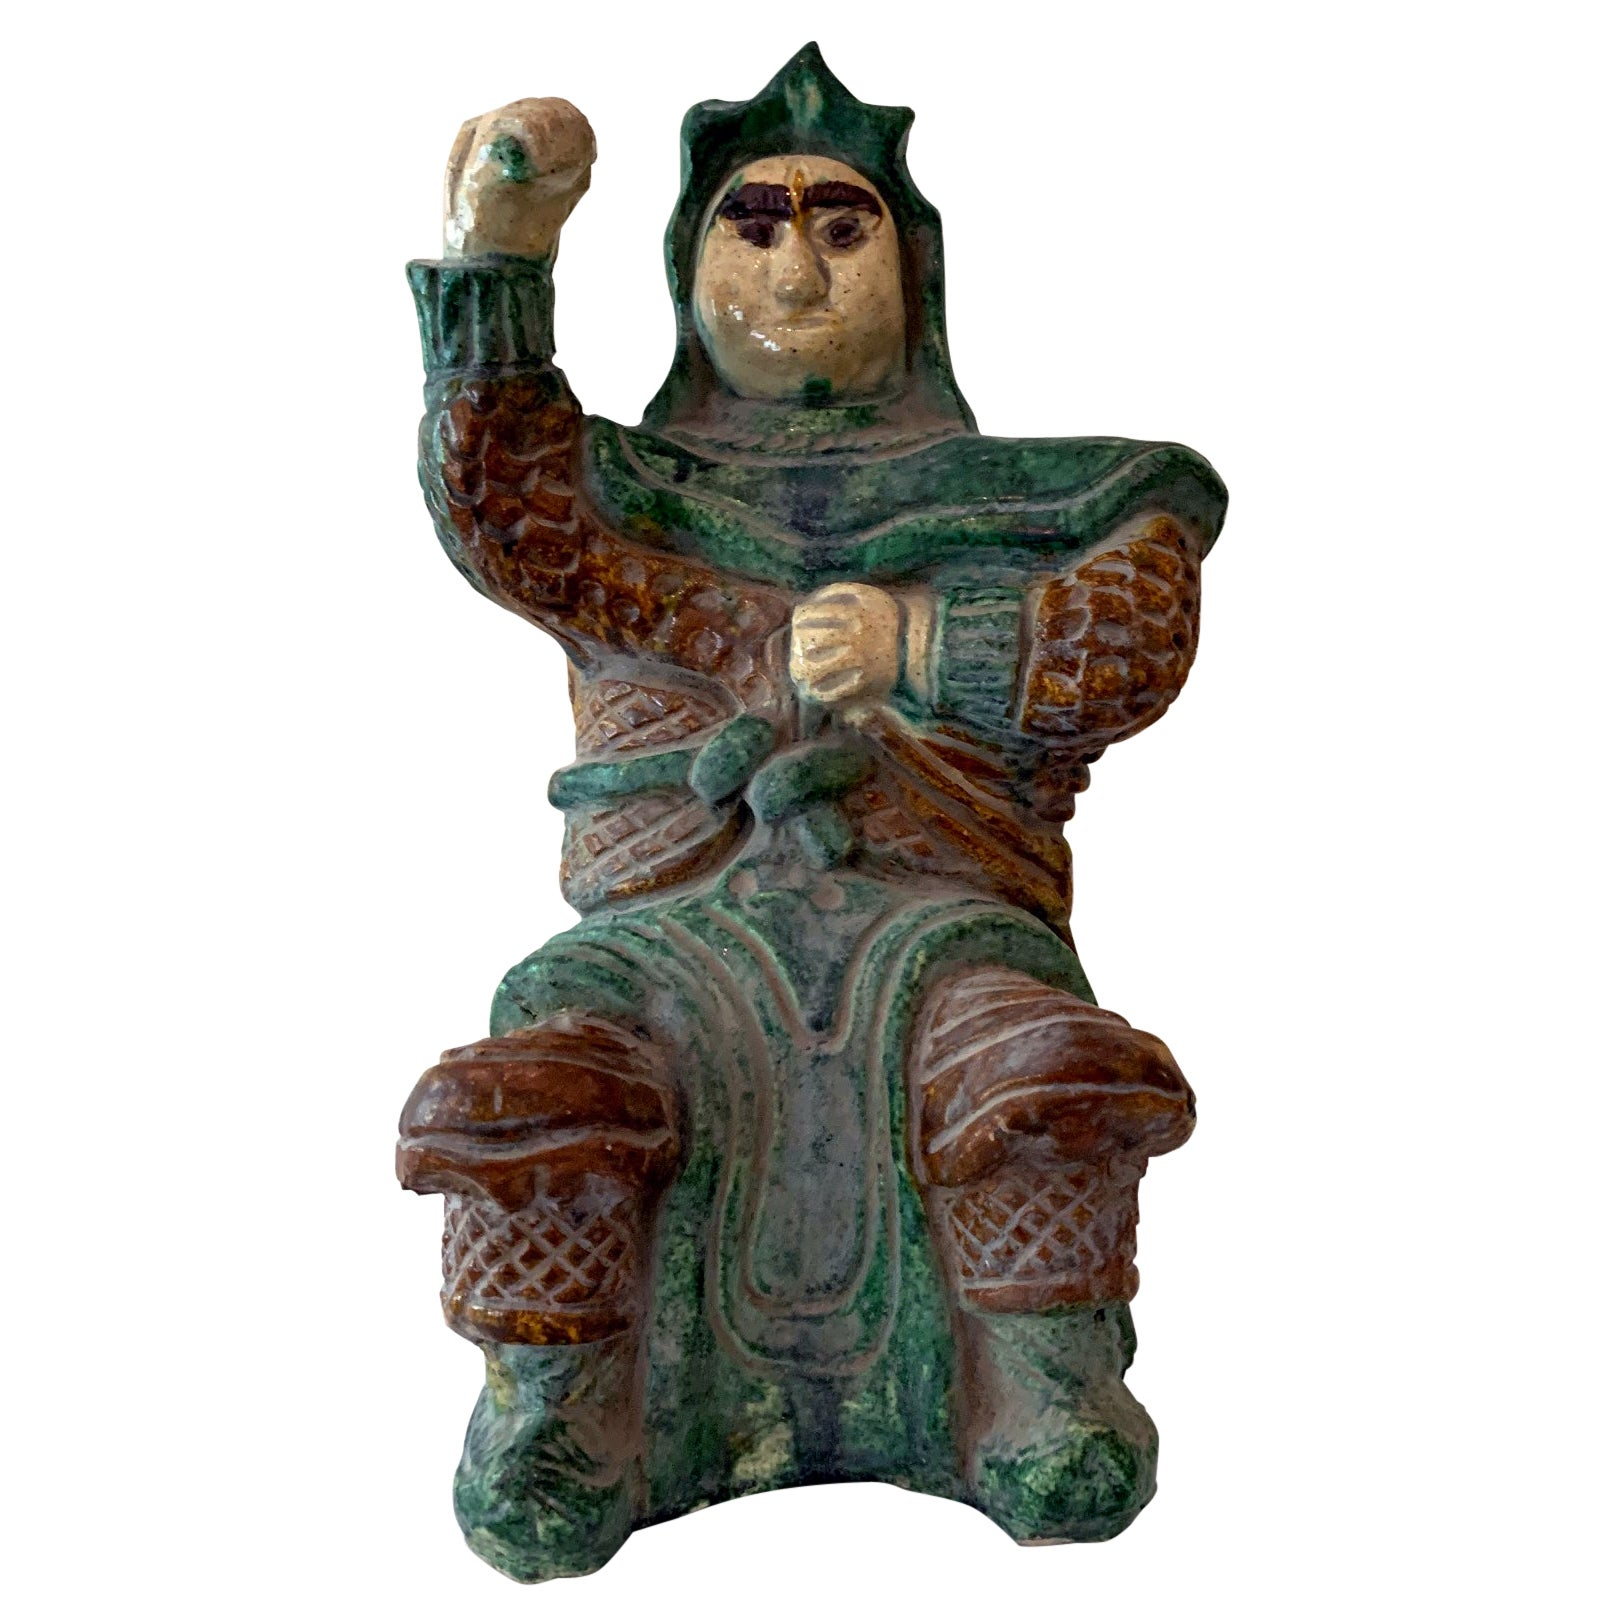 Chinese Ceramic Glazed Guardian Ming Dynasty